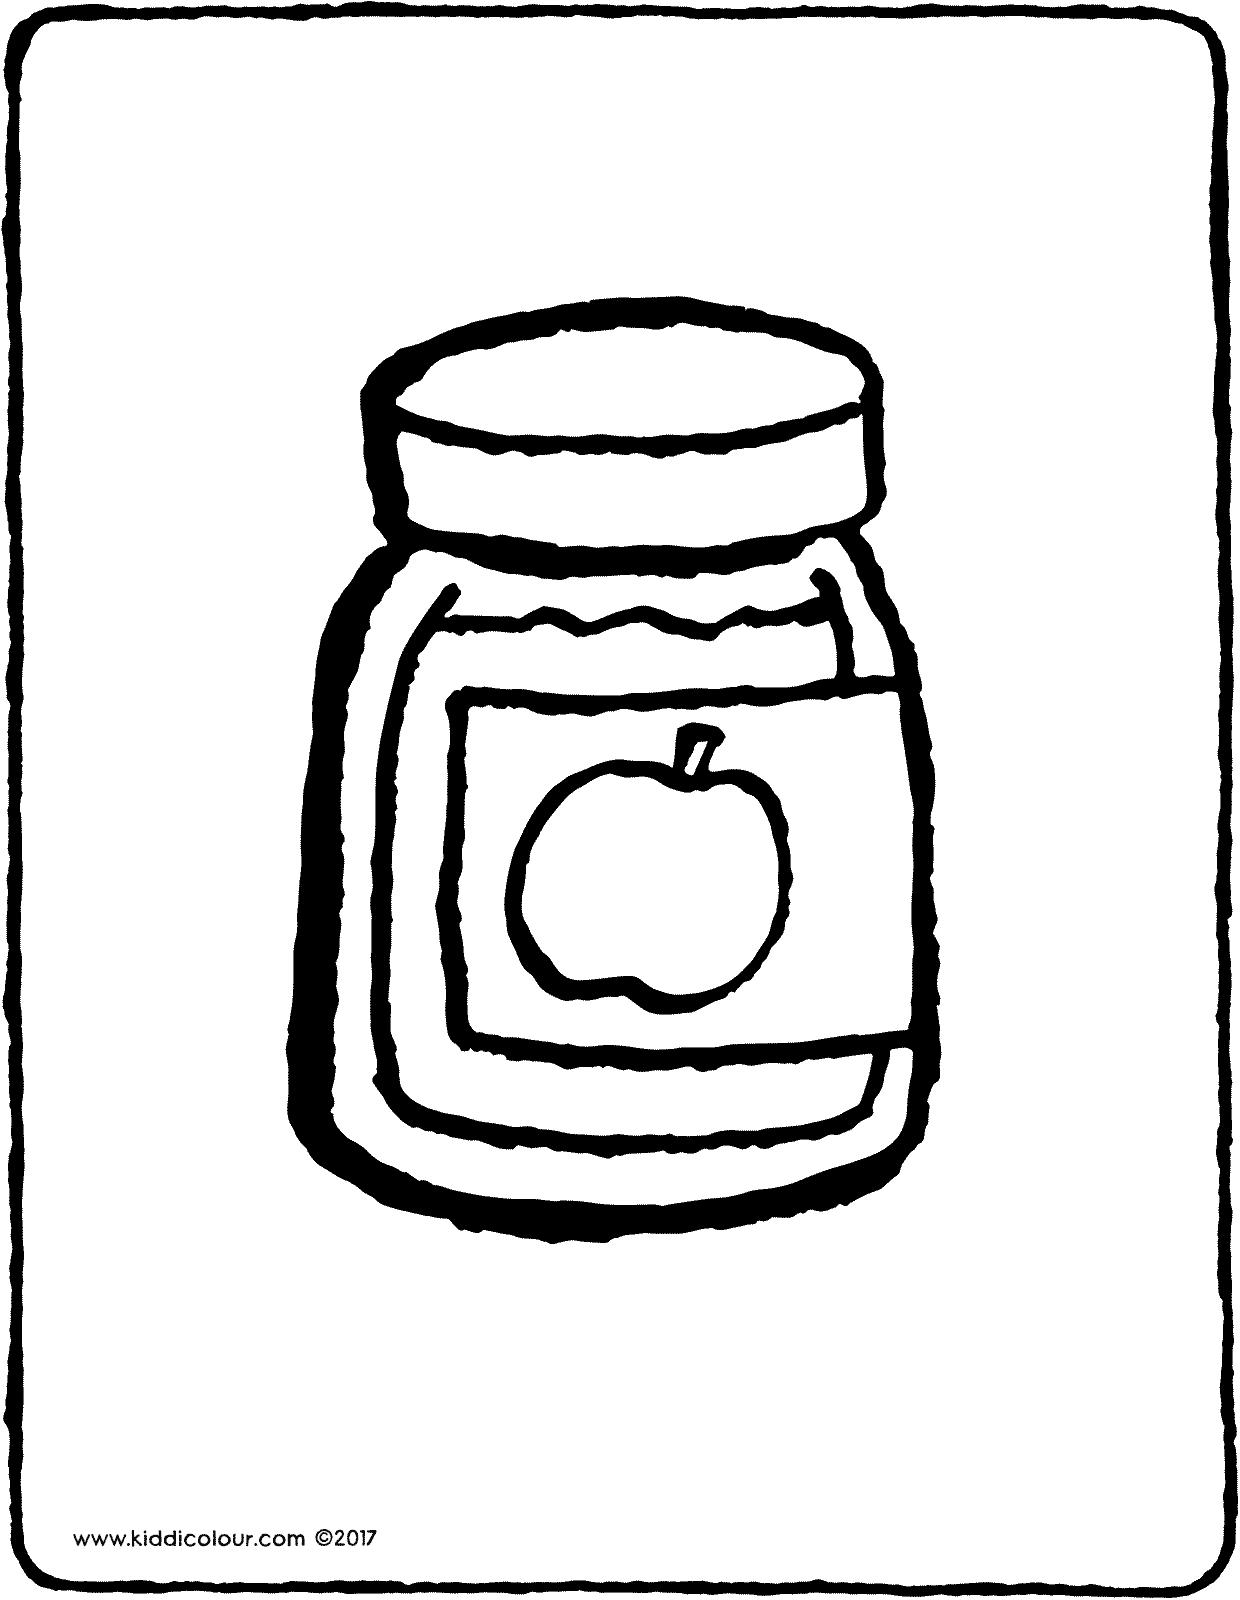 1240x1600 Apple Sauce In A Jar